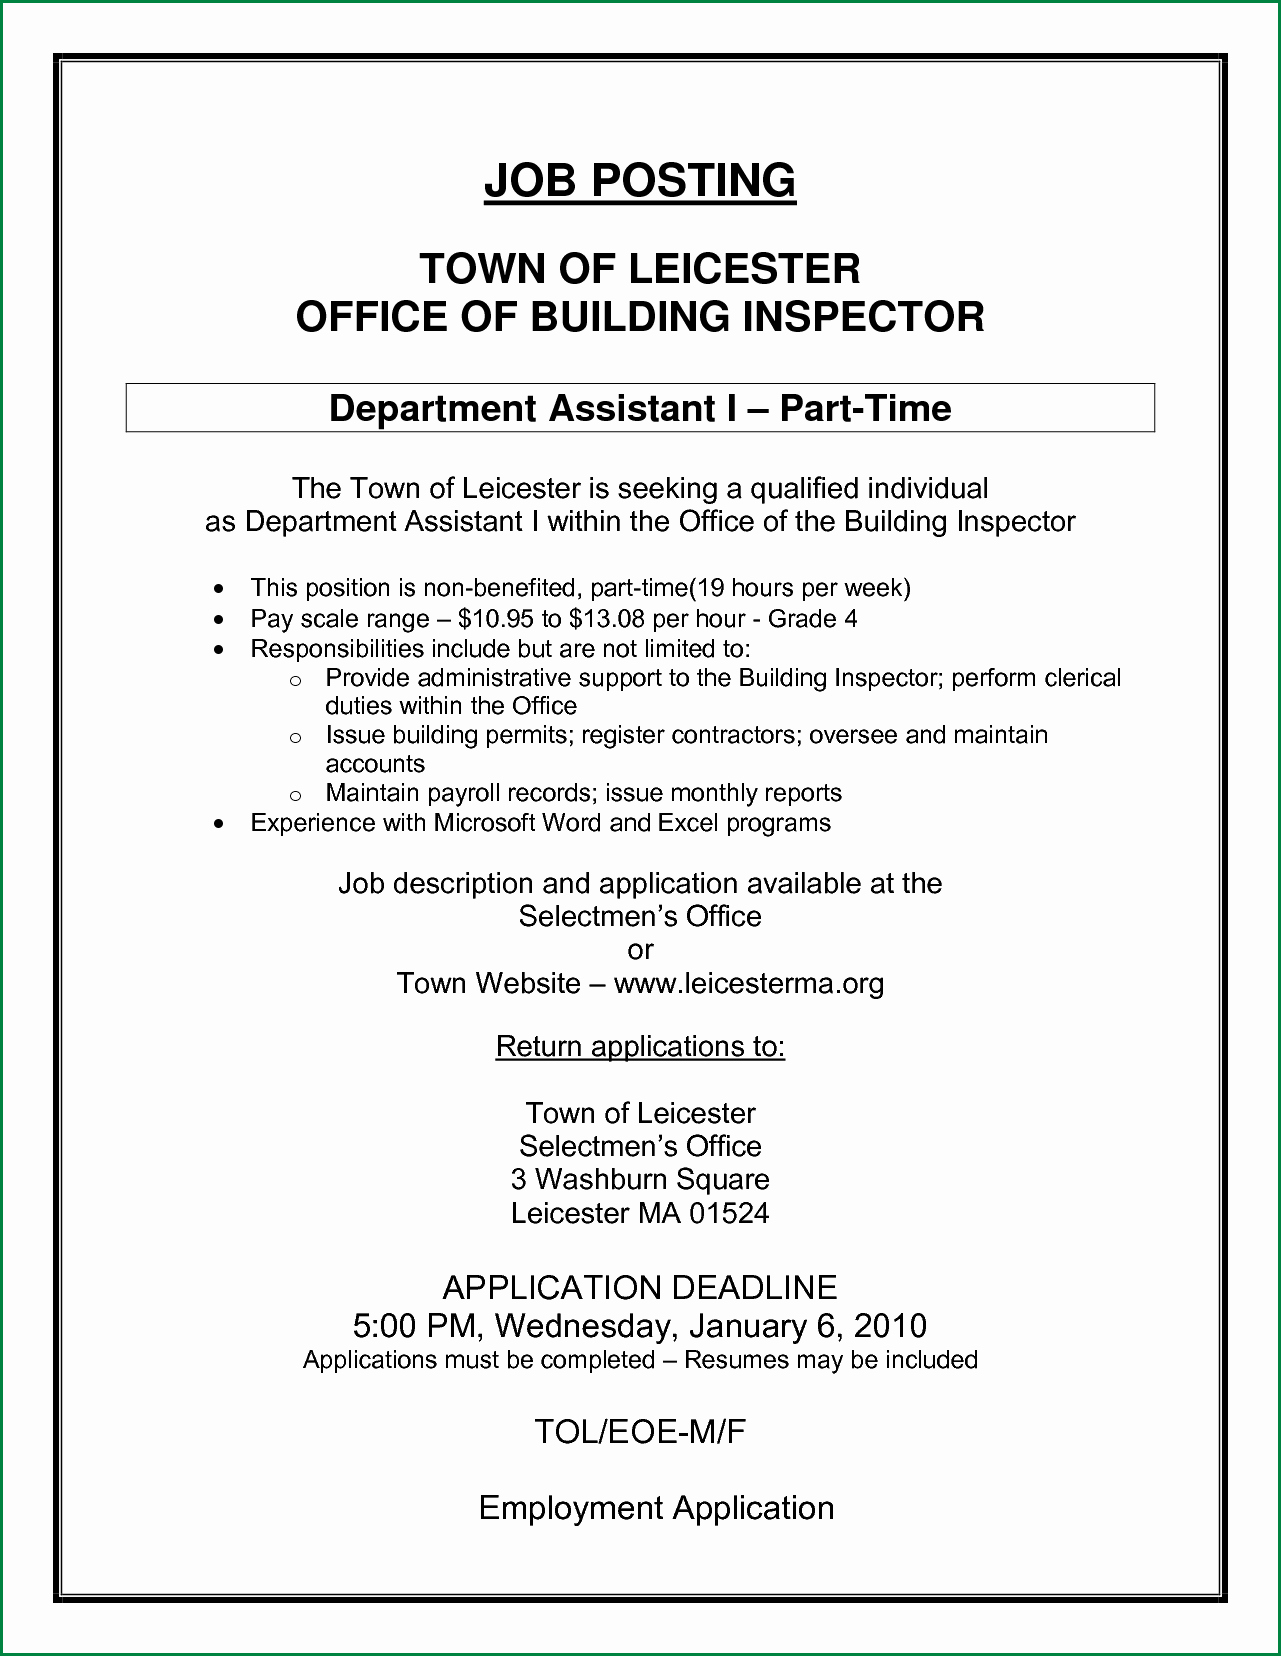 Job Posting Examples New Sample Application Letter for Internal Job Vacancy